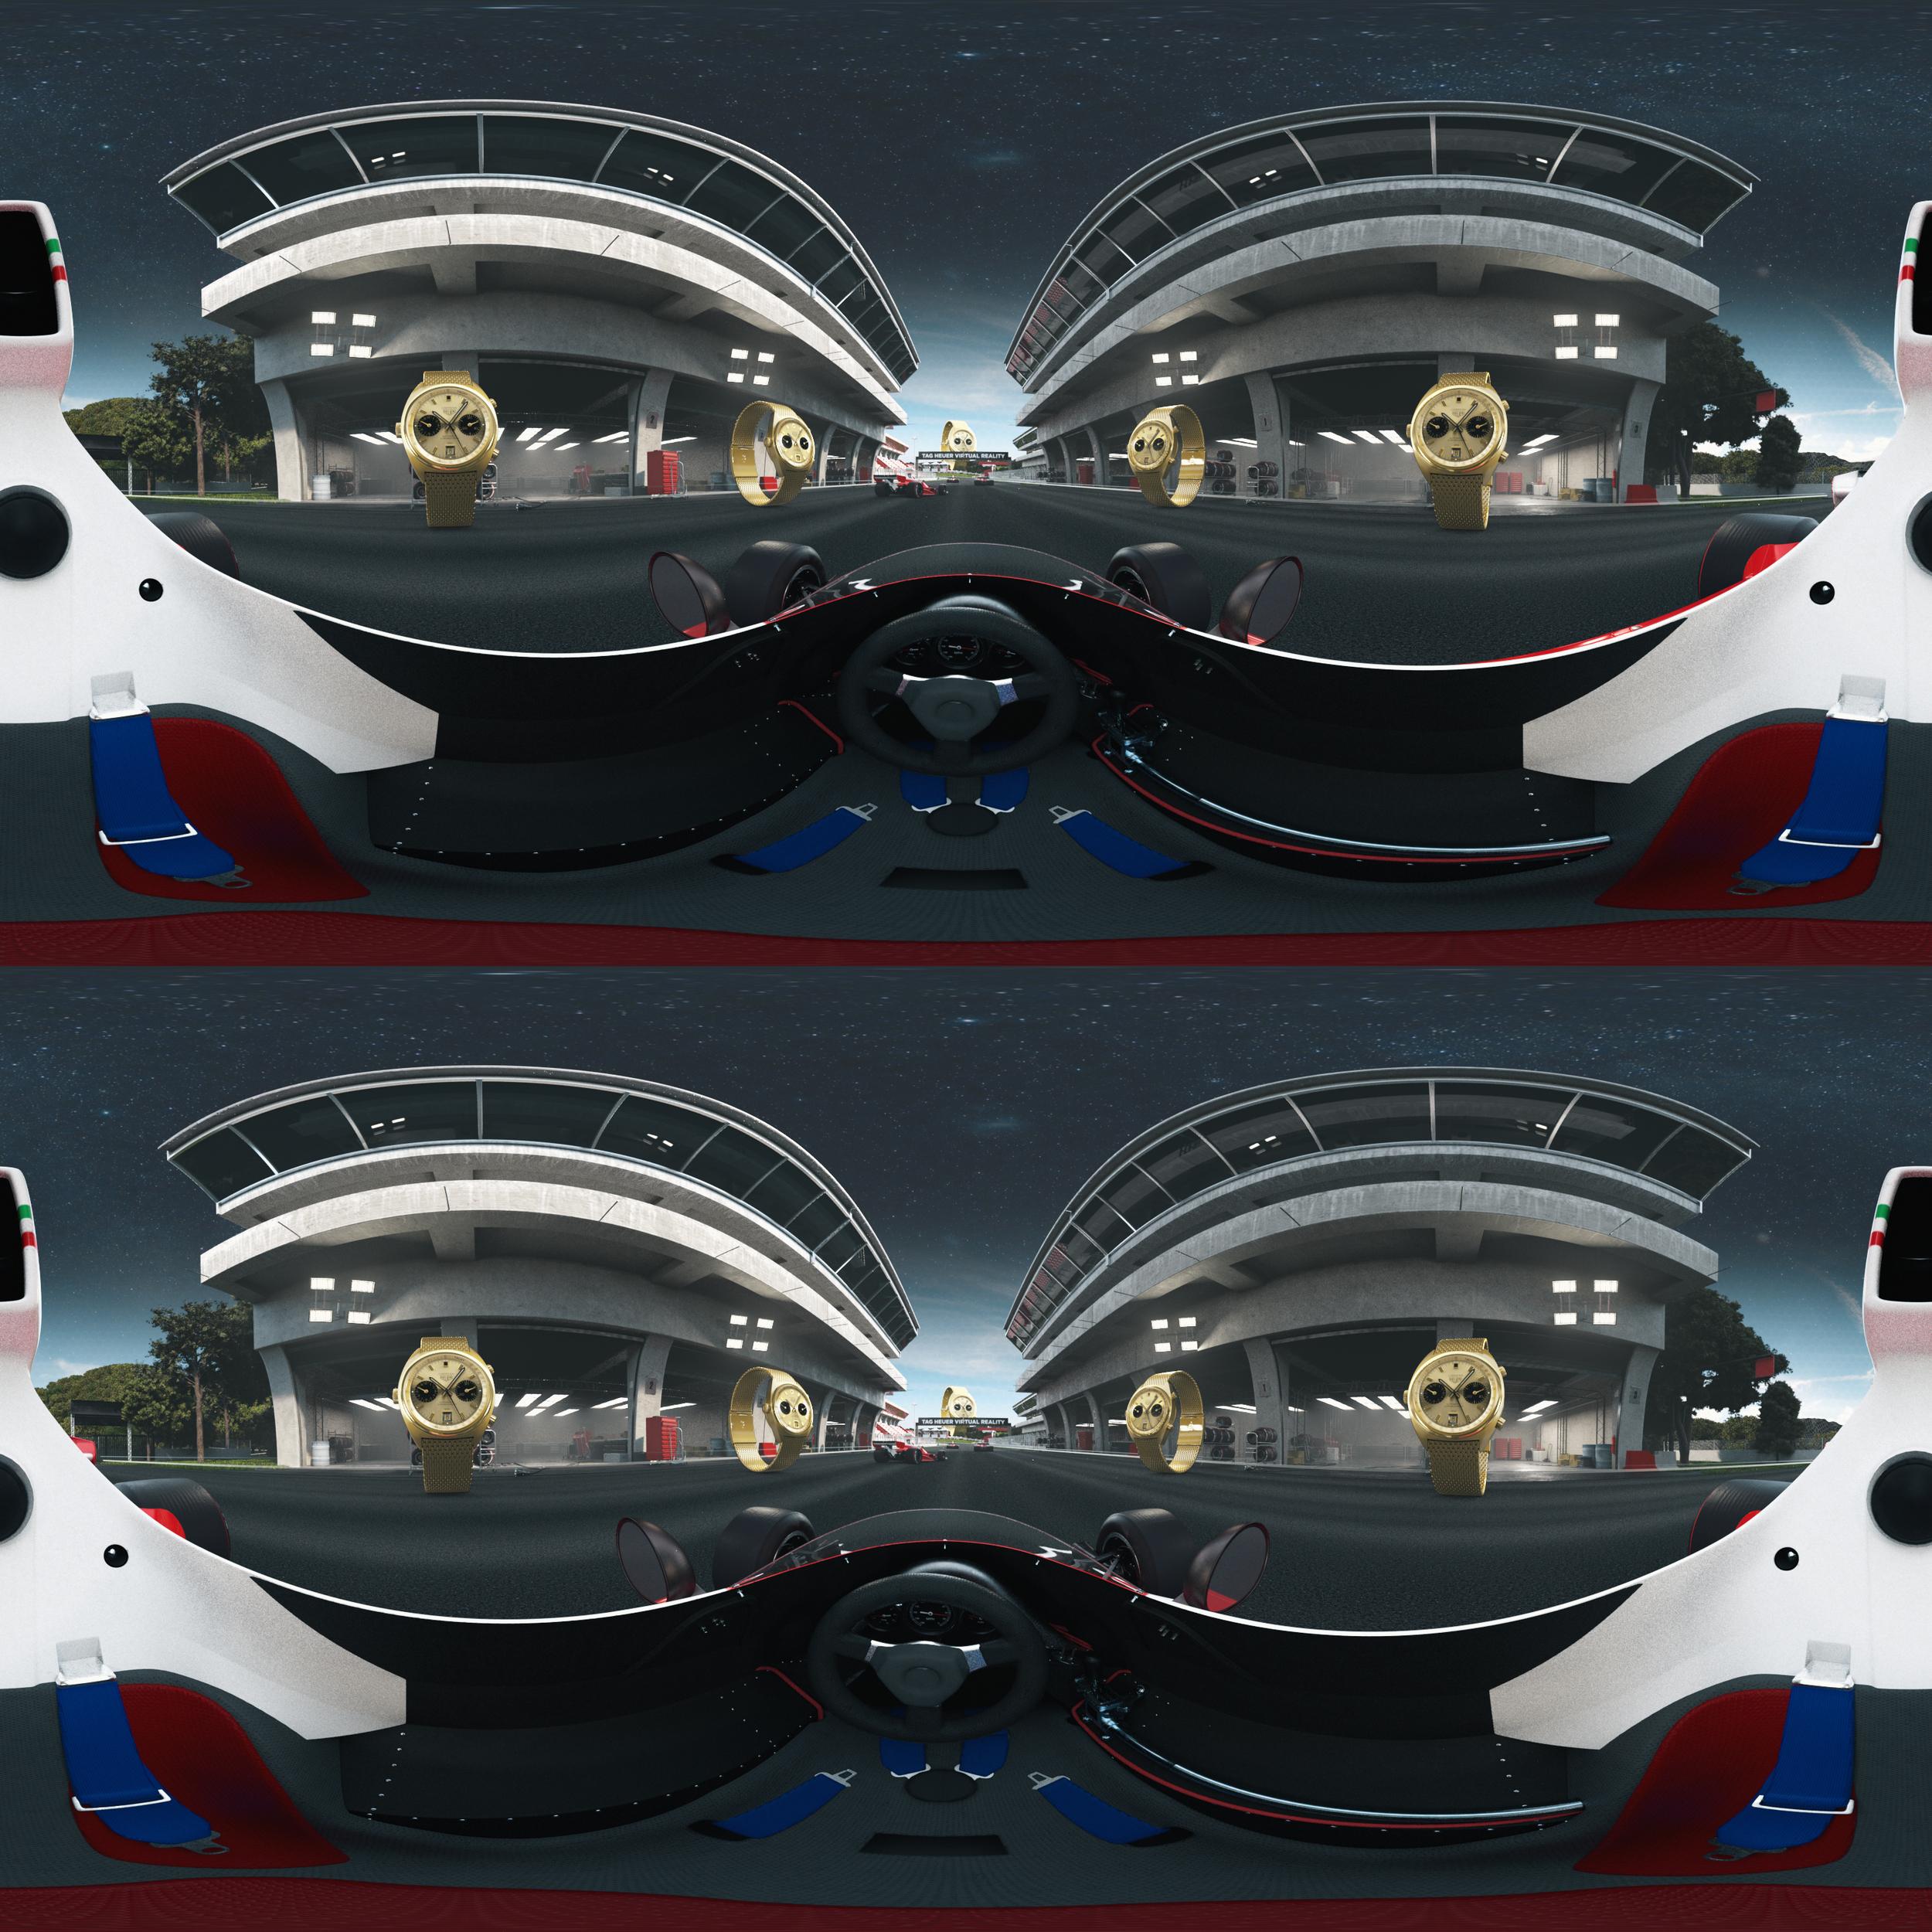 TH-VR_DemoStereo_05_TB.jpg